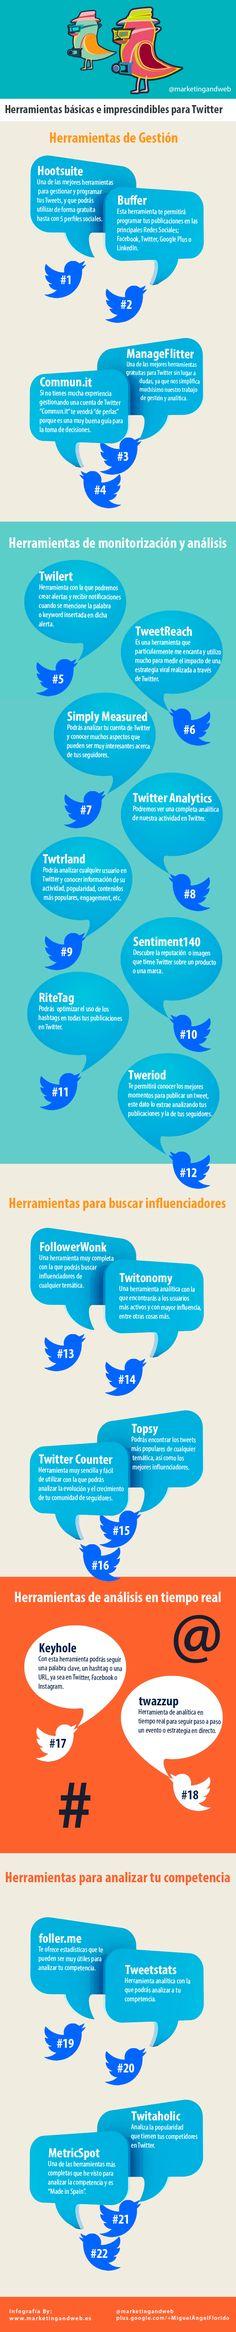 Herramientas gratuitas para Twitter básicas e imprescindibles #infografía